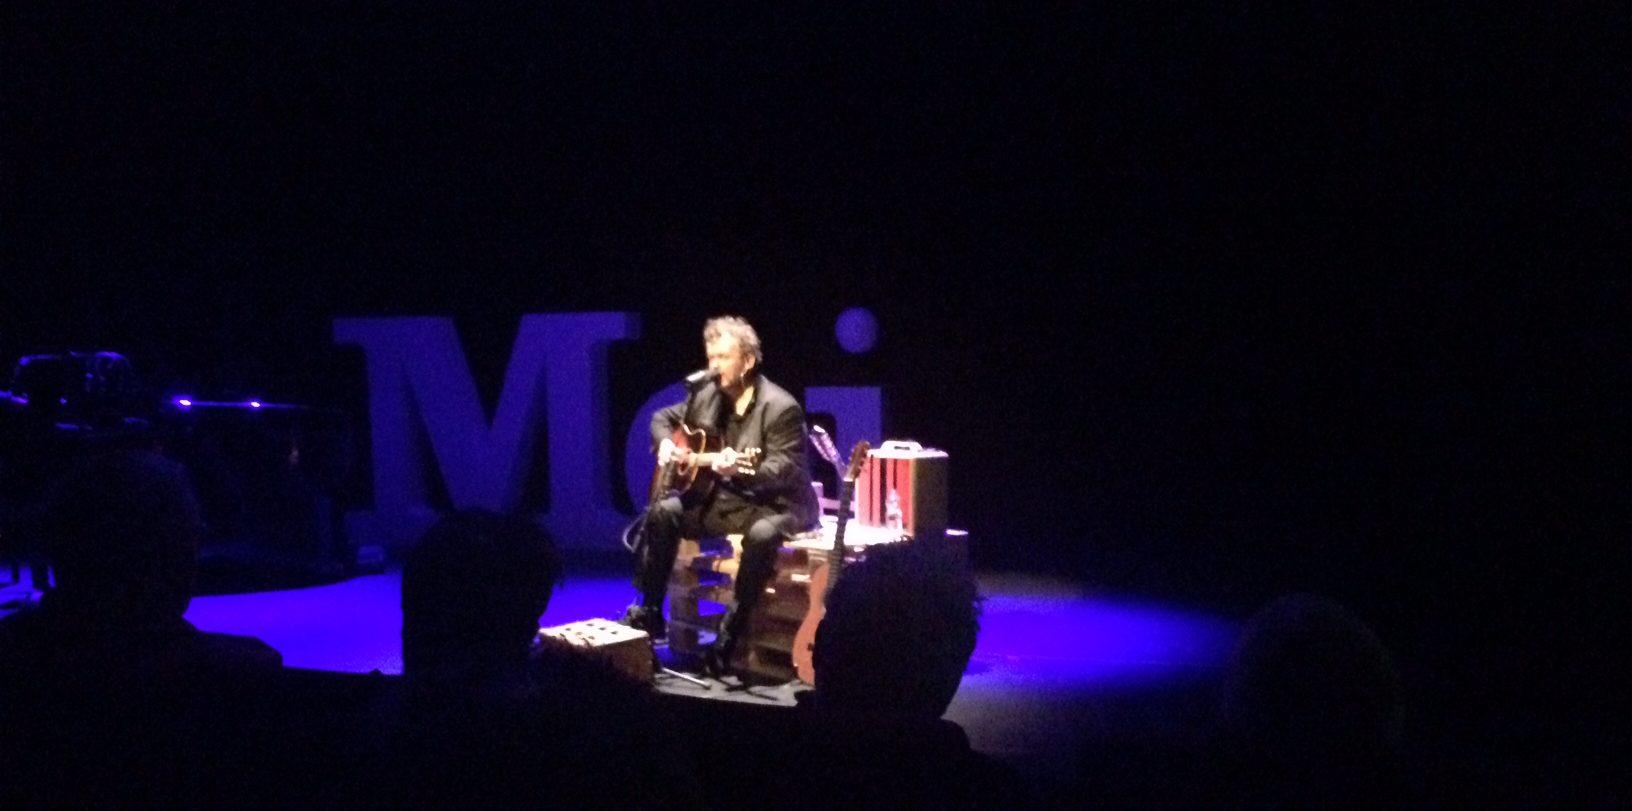 Concertreview: Laot Mij Maor Lekker Dit Doen! – Daniël Lohues